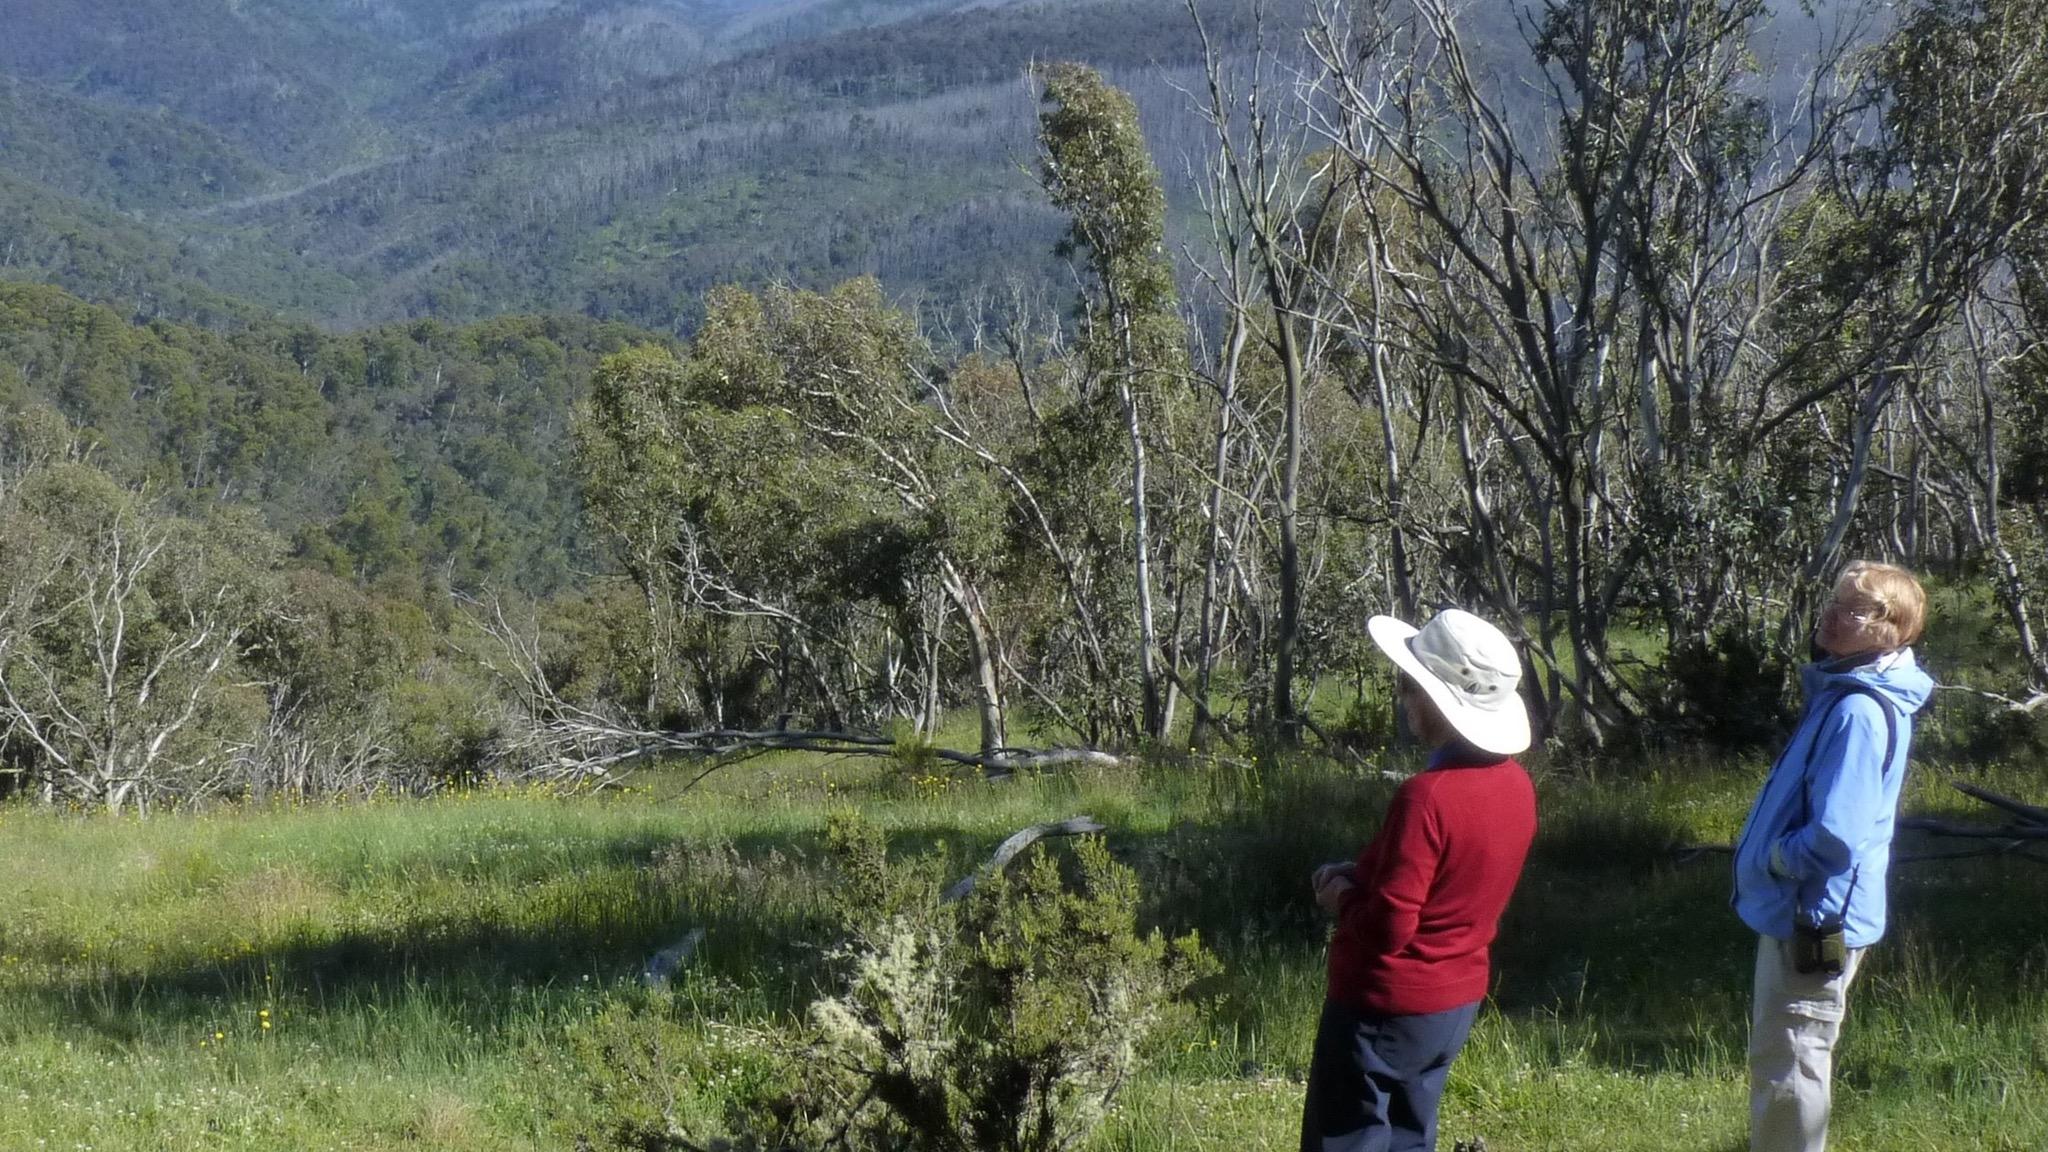 Enjoy mountain views on easy guided walks